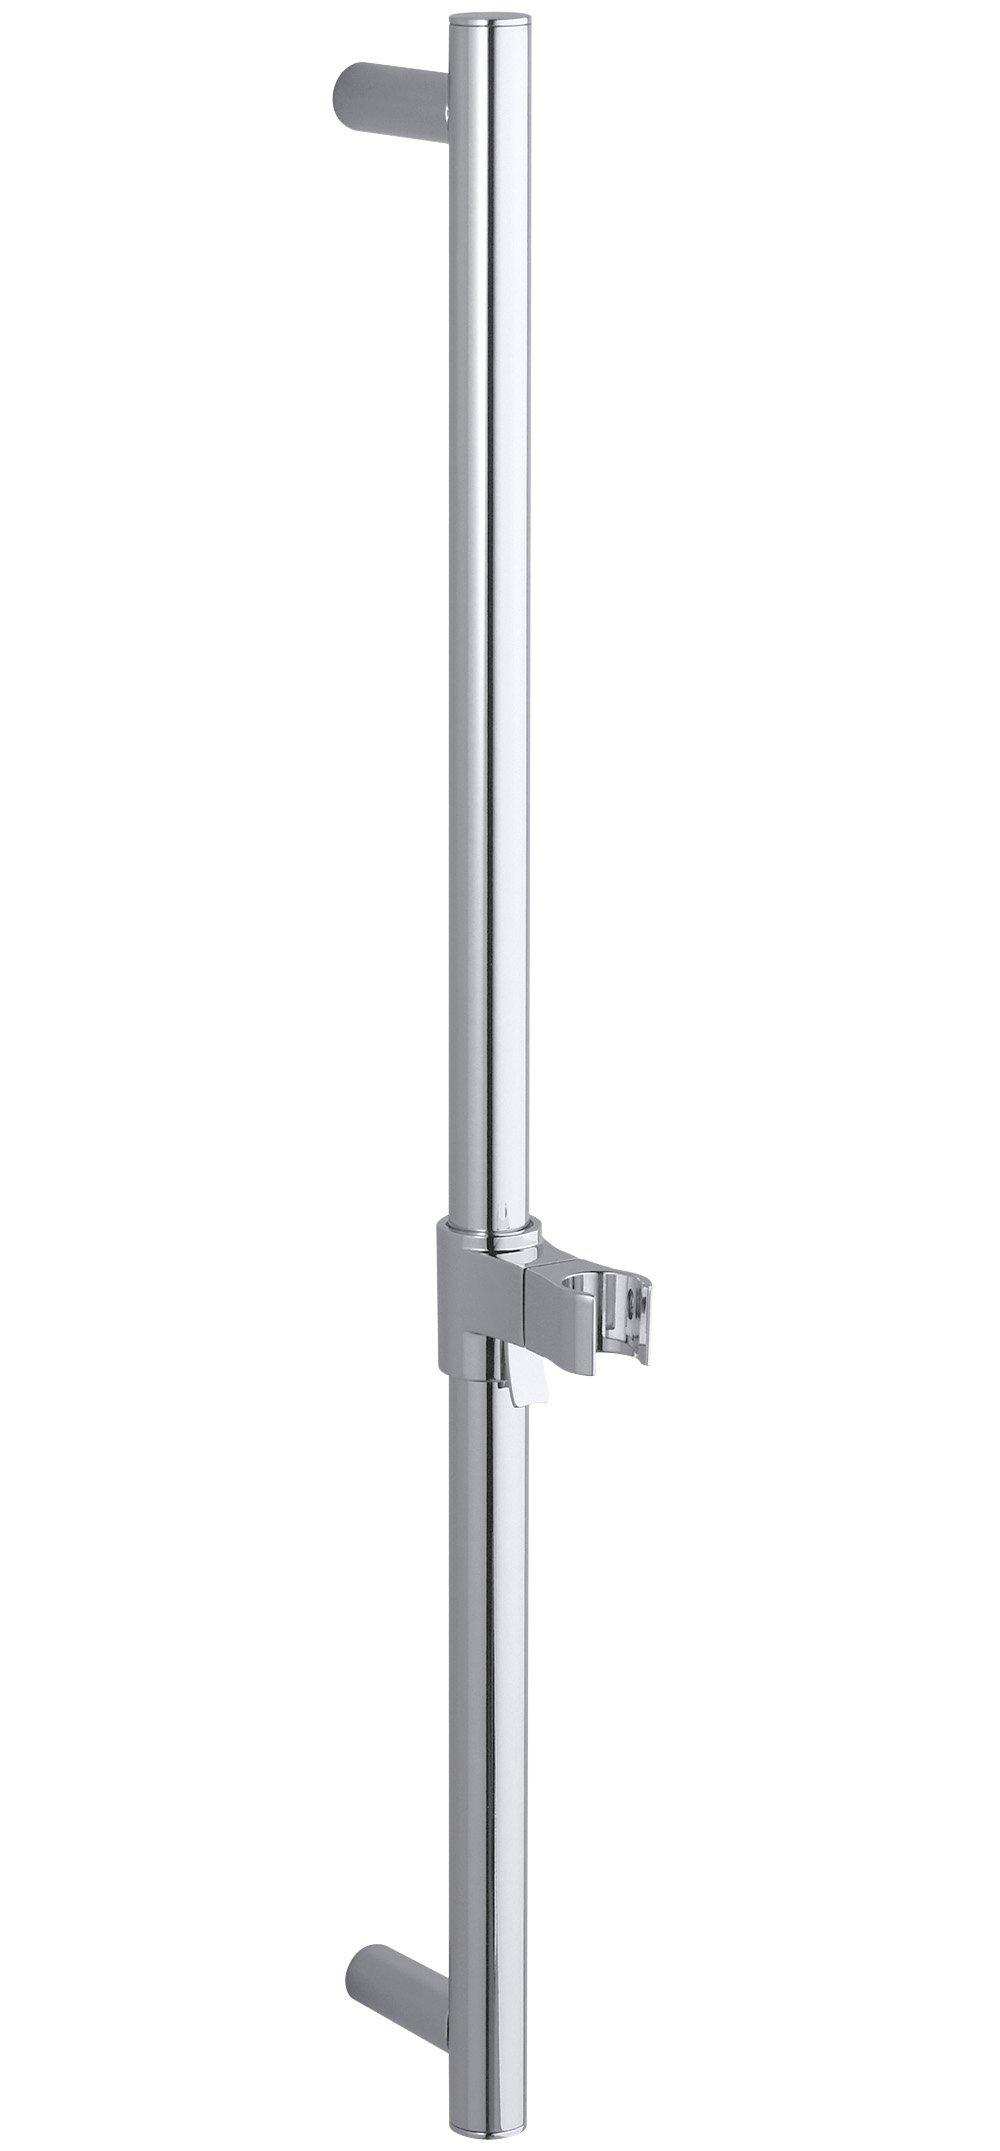 Kohler K-9069-CP 24-Inch Shower Slide Bar, Polished Chrome by Kohler